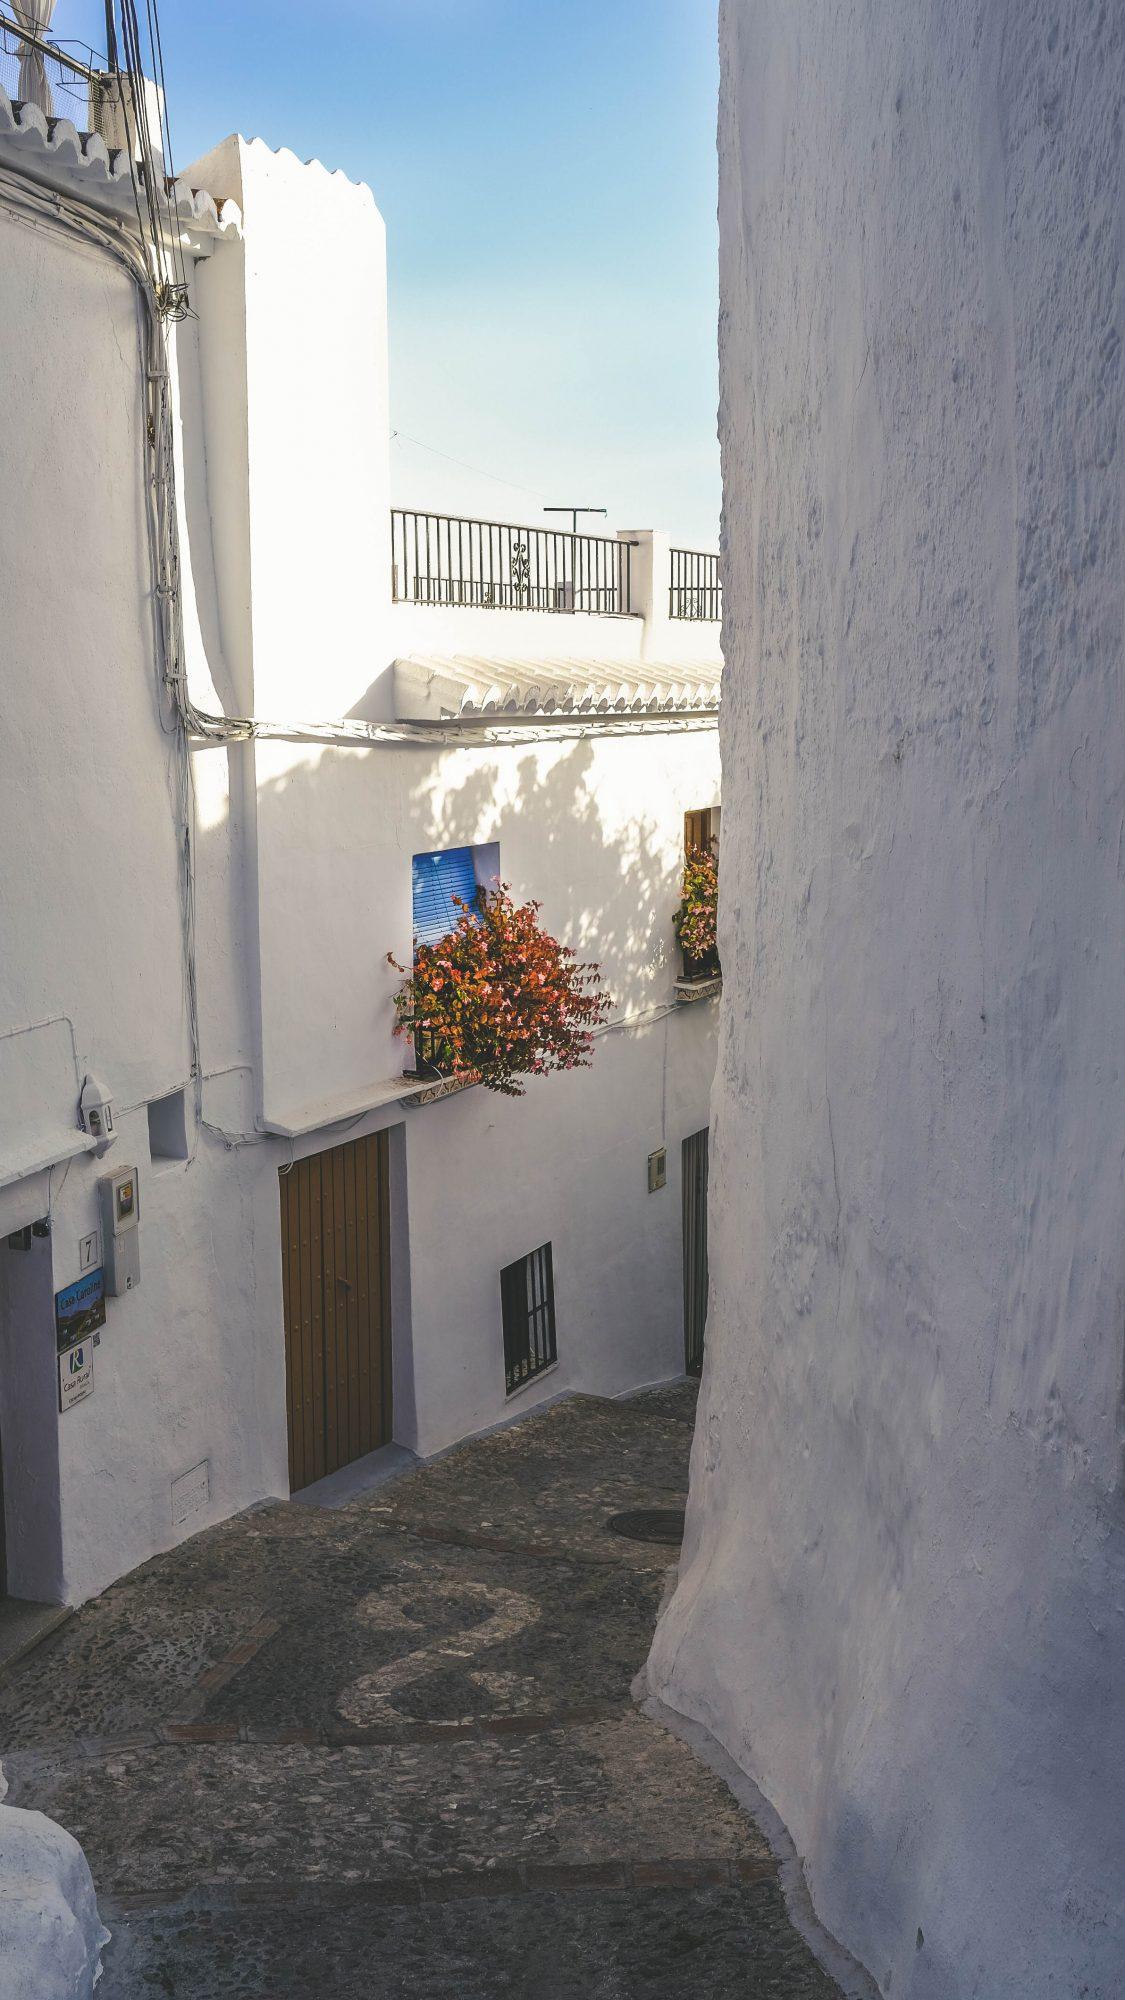 Ruelle au volet bleu - Frigiliana, Espagne